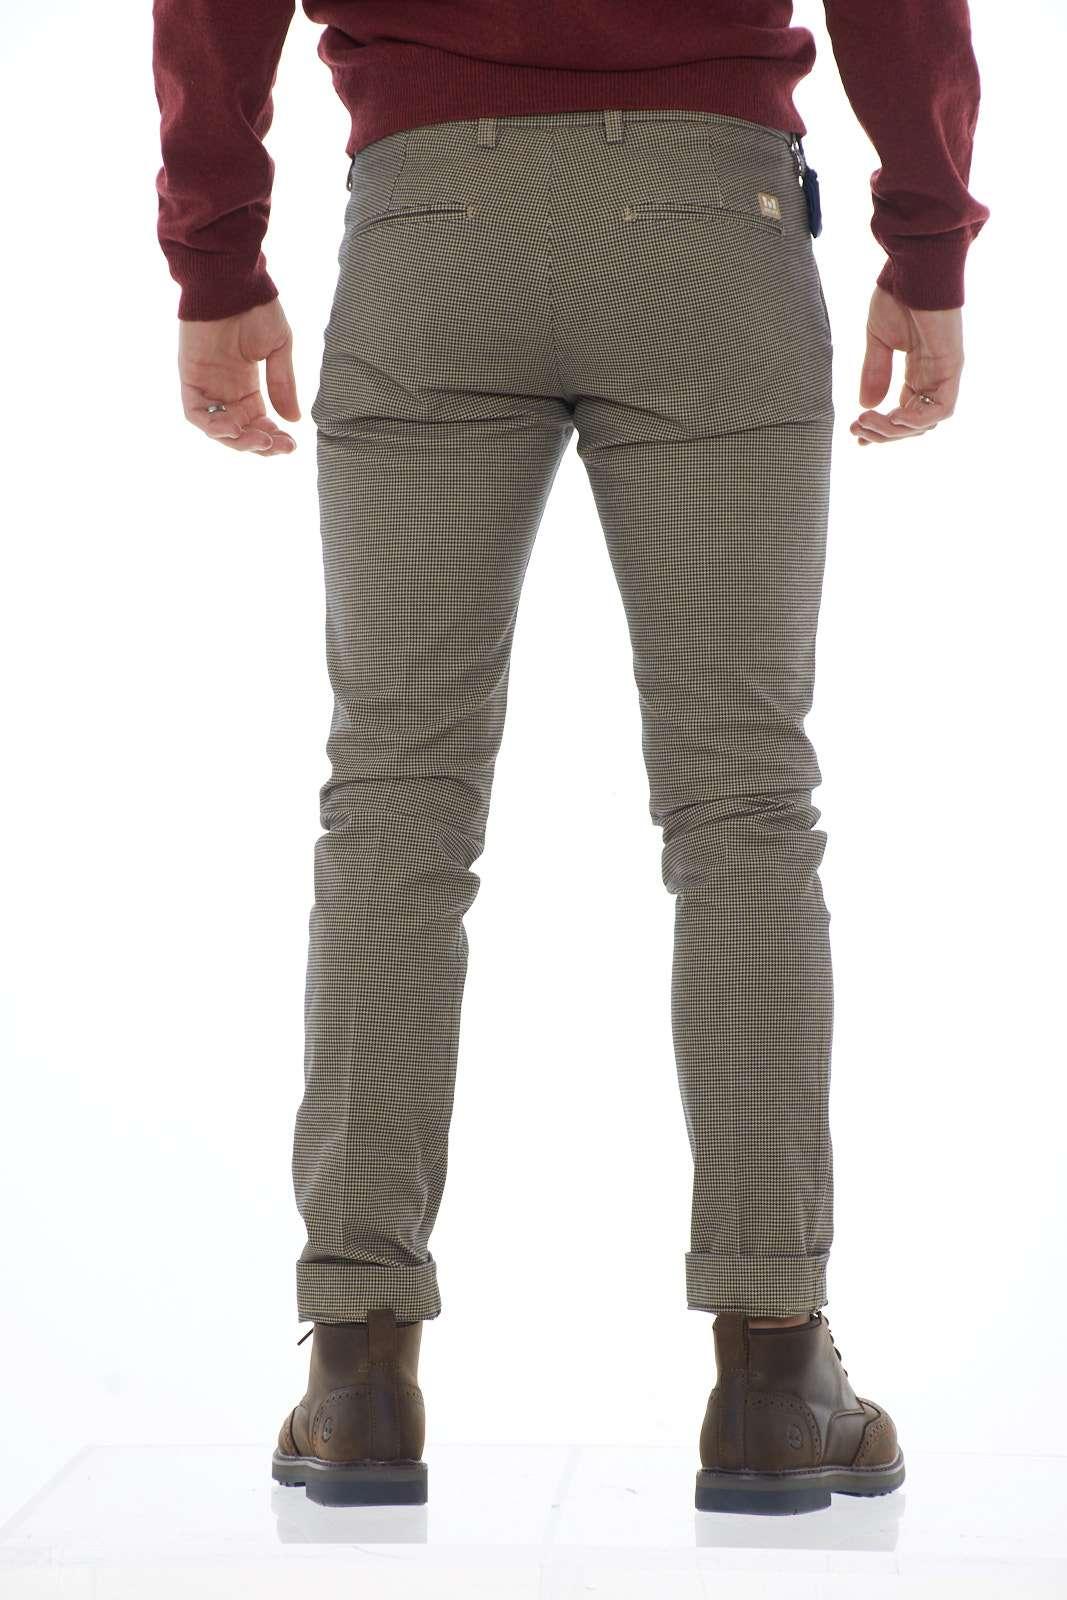 https://www.parmax.com/media/catalog/product/a/i/ai-outlet_parmax-pantaloni-uomo-entre-amis-a1982011536l17-c.jpg